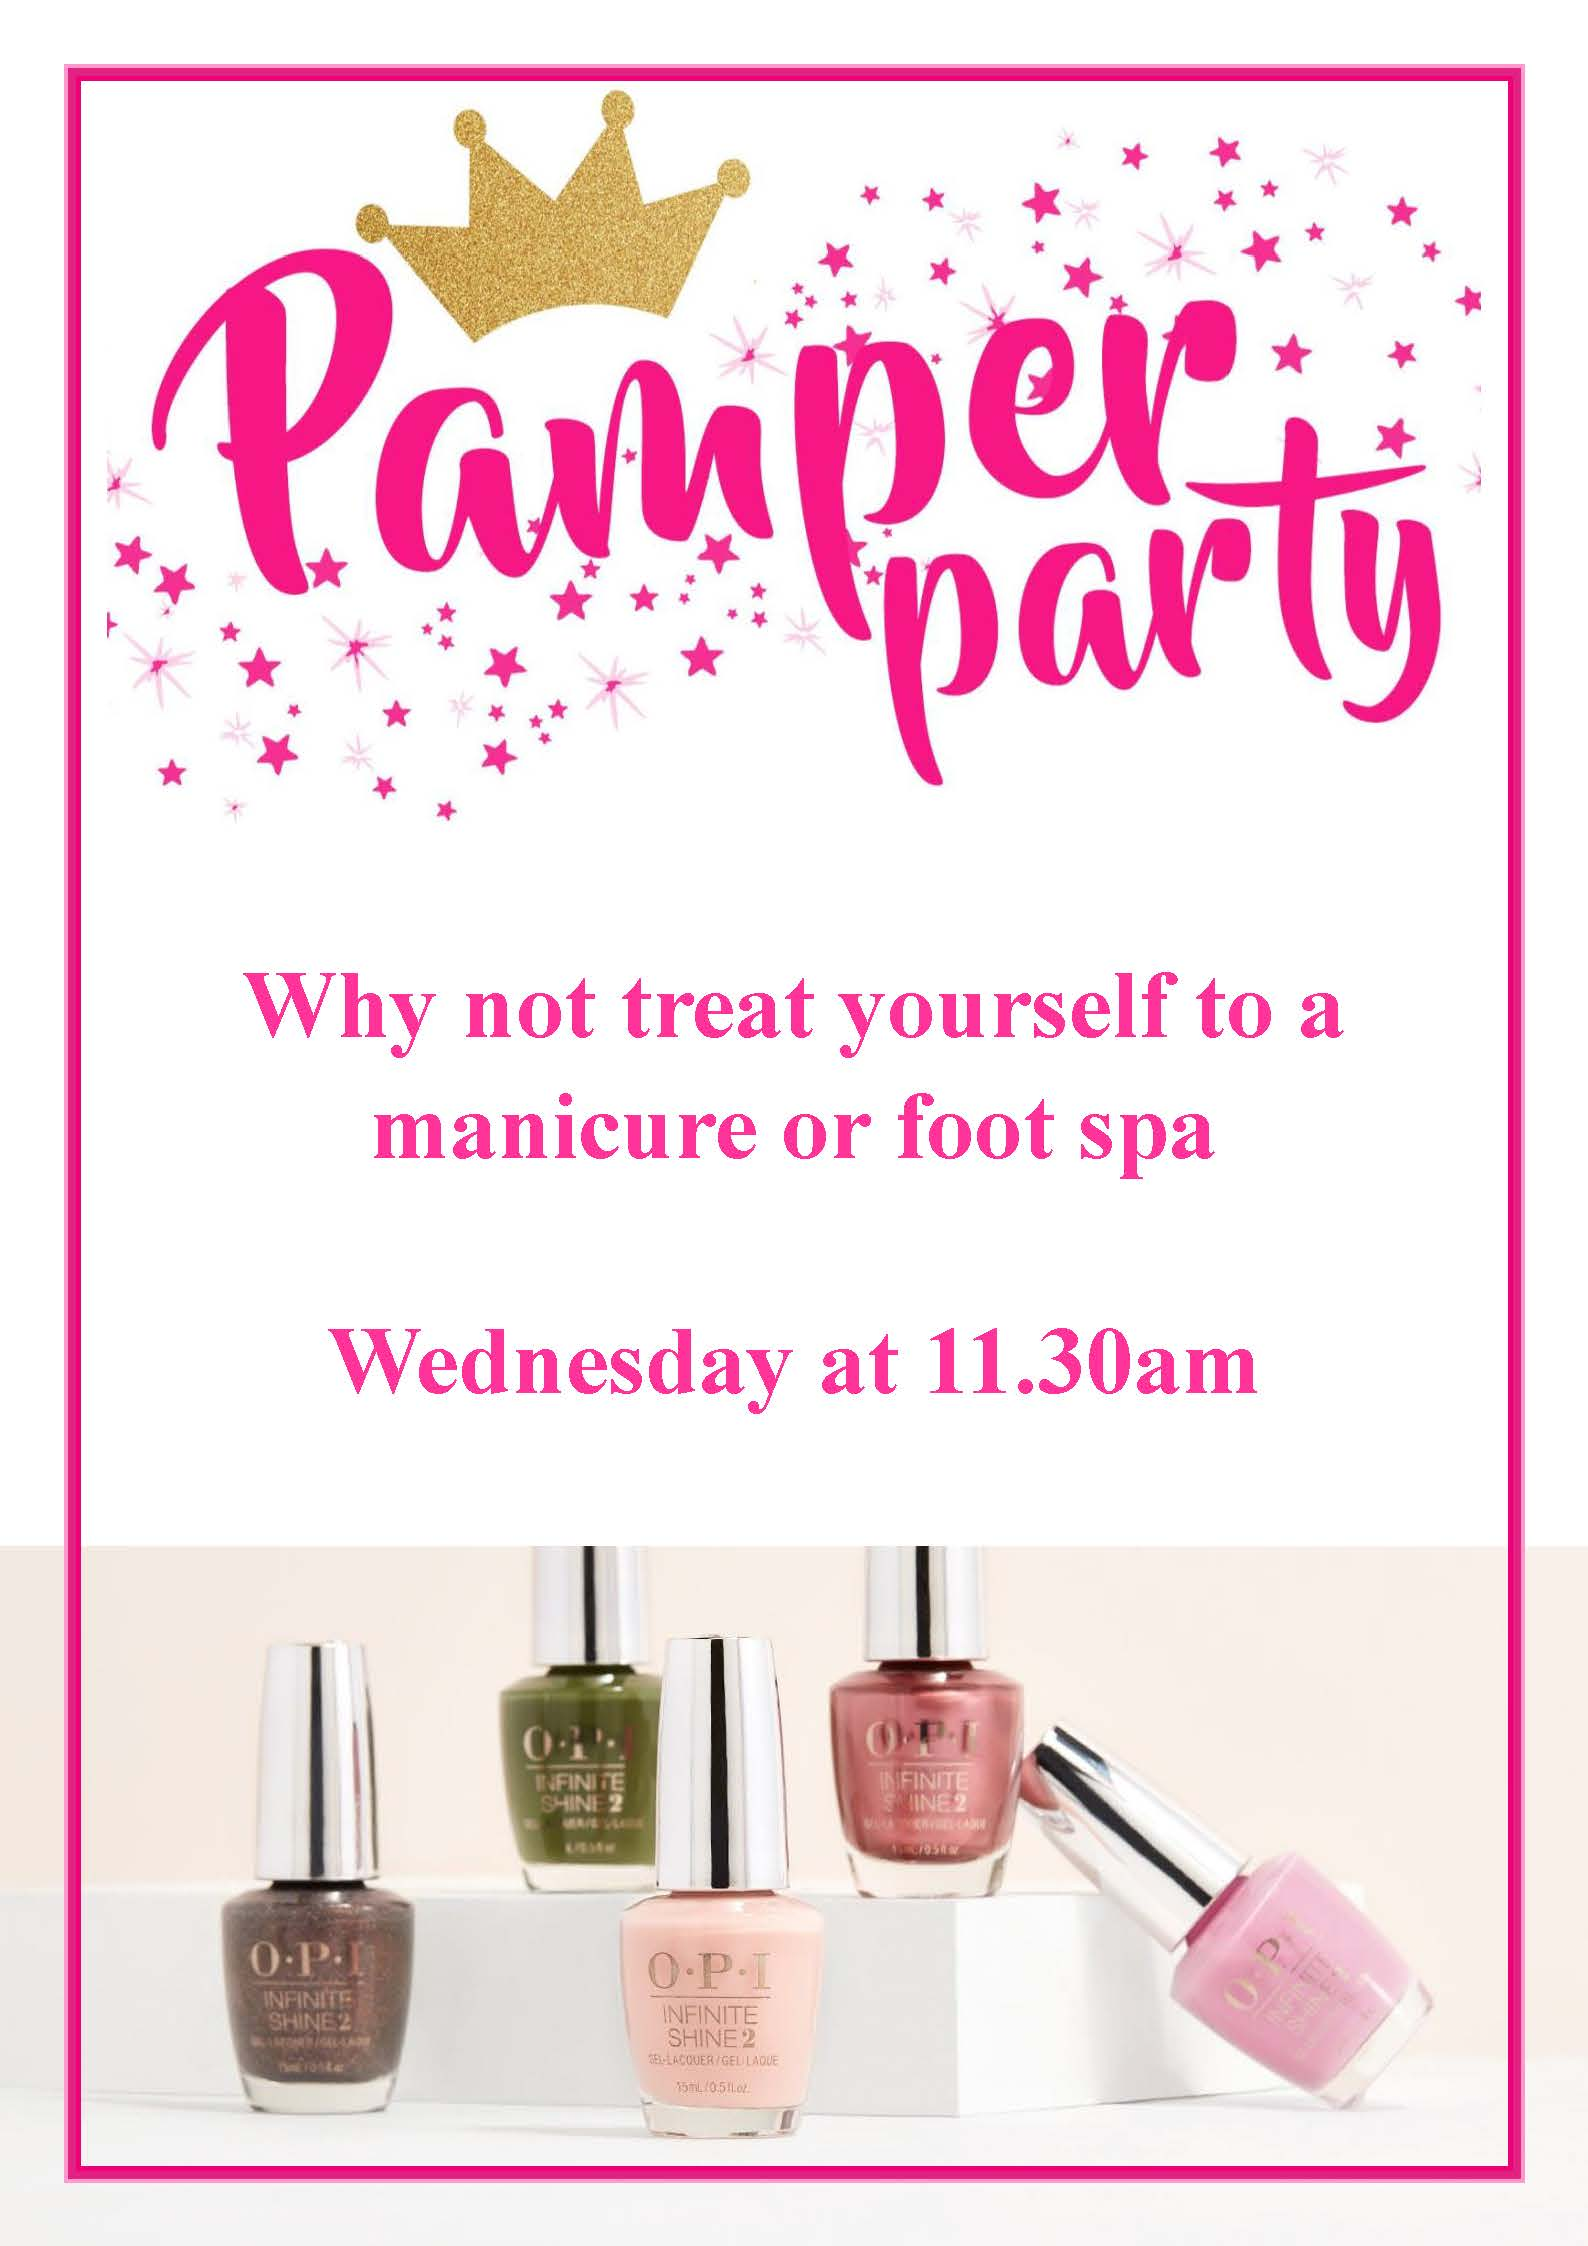 Pamper poster Wednesday